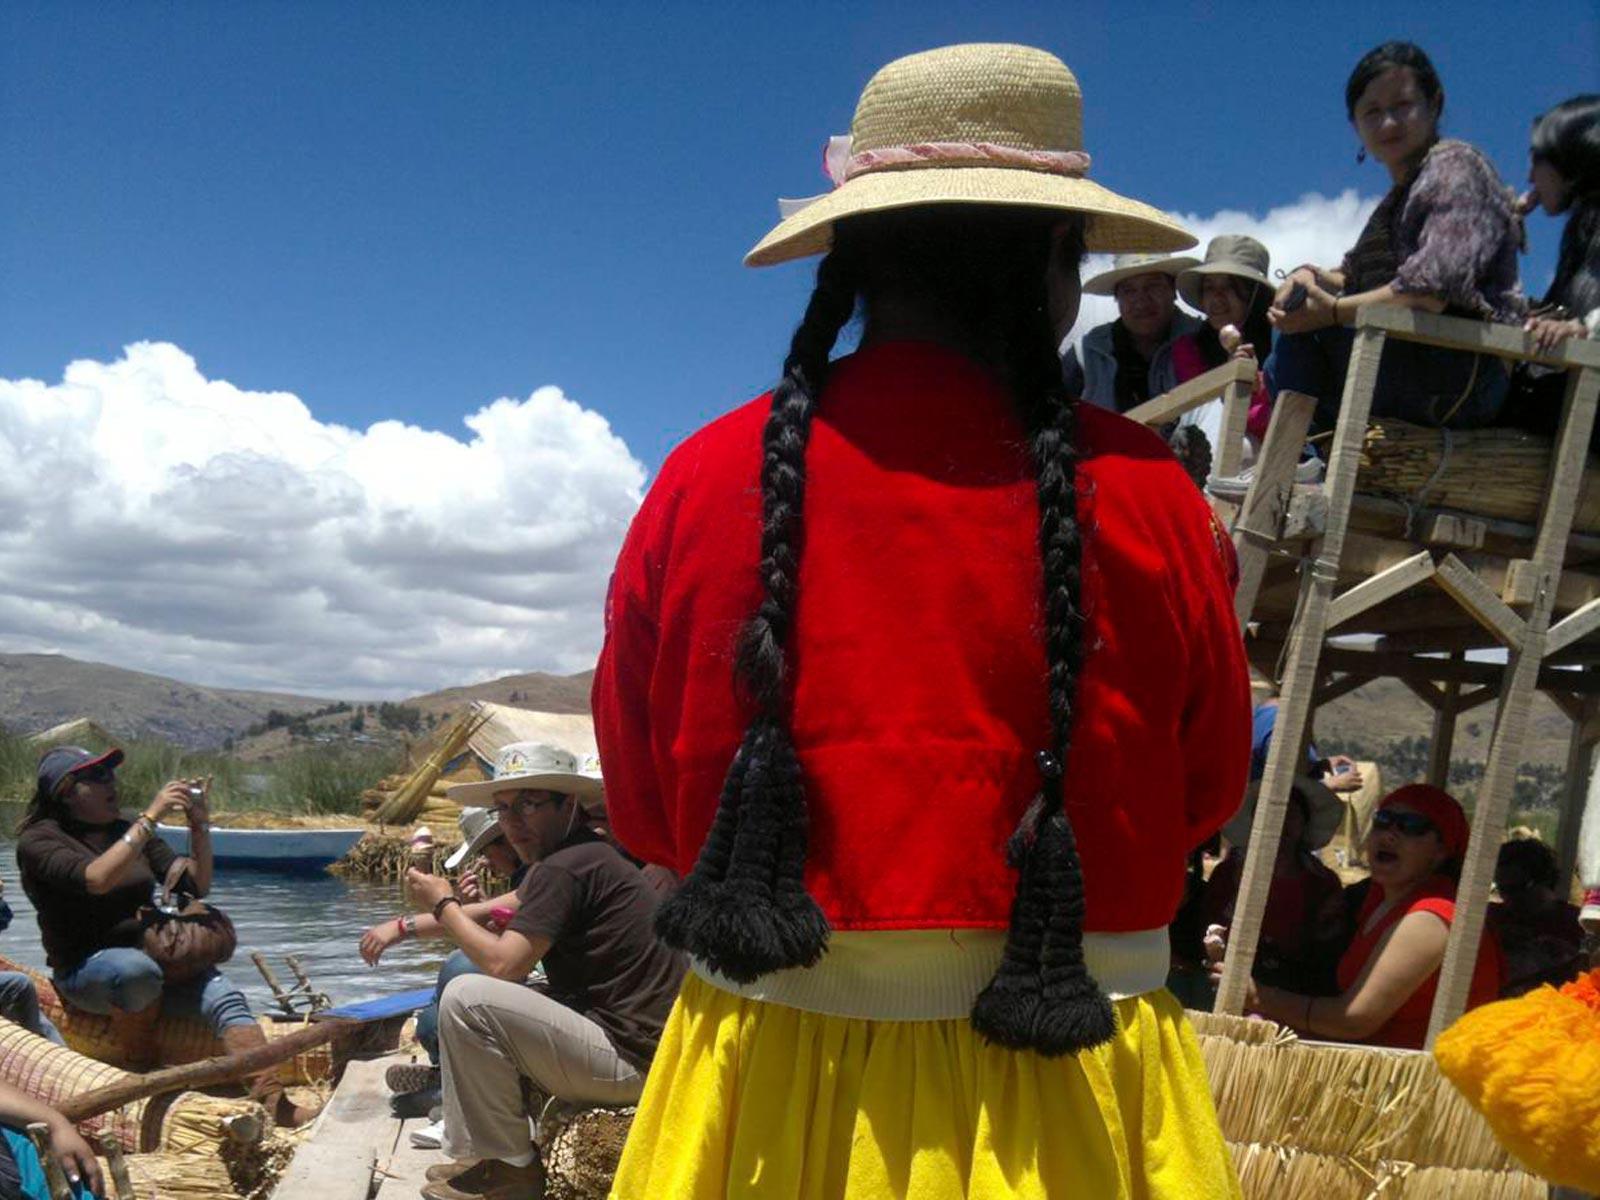 Peru-titikaka-youg-girl-boat-trip-sun